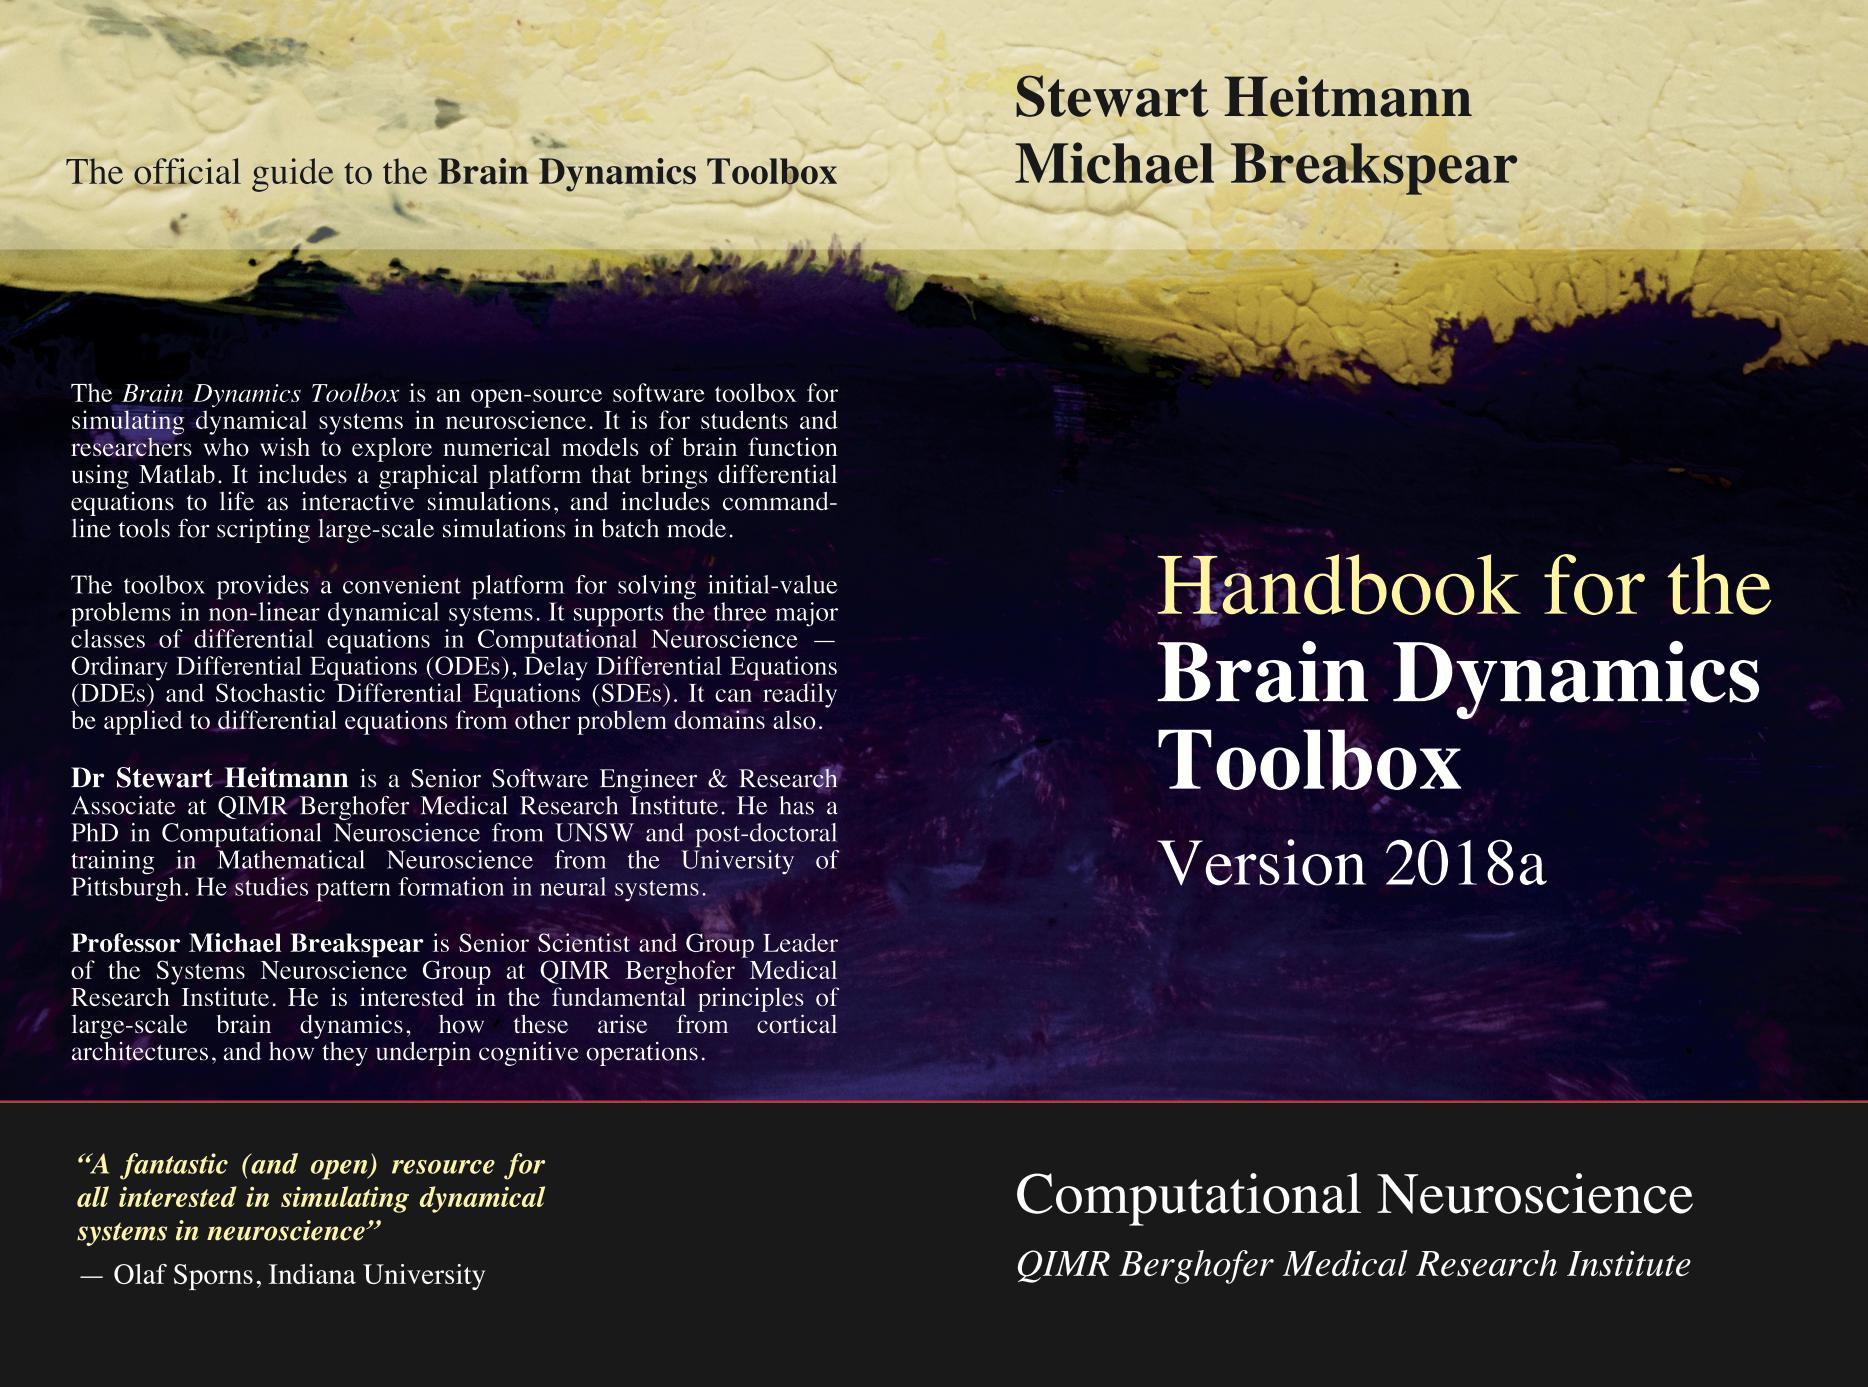 Handbook for the Brain Dynamics Toolbox